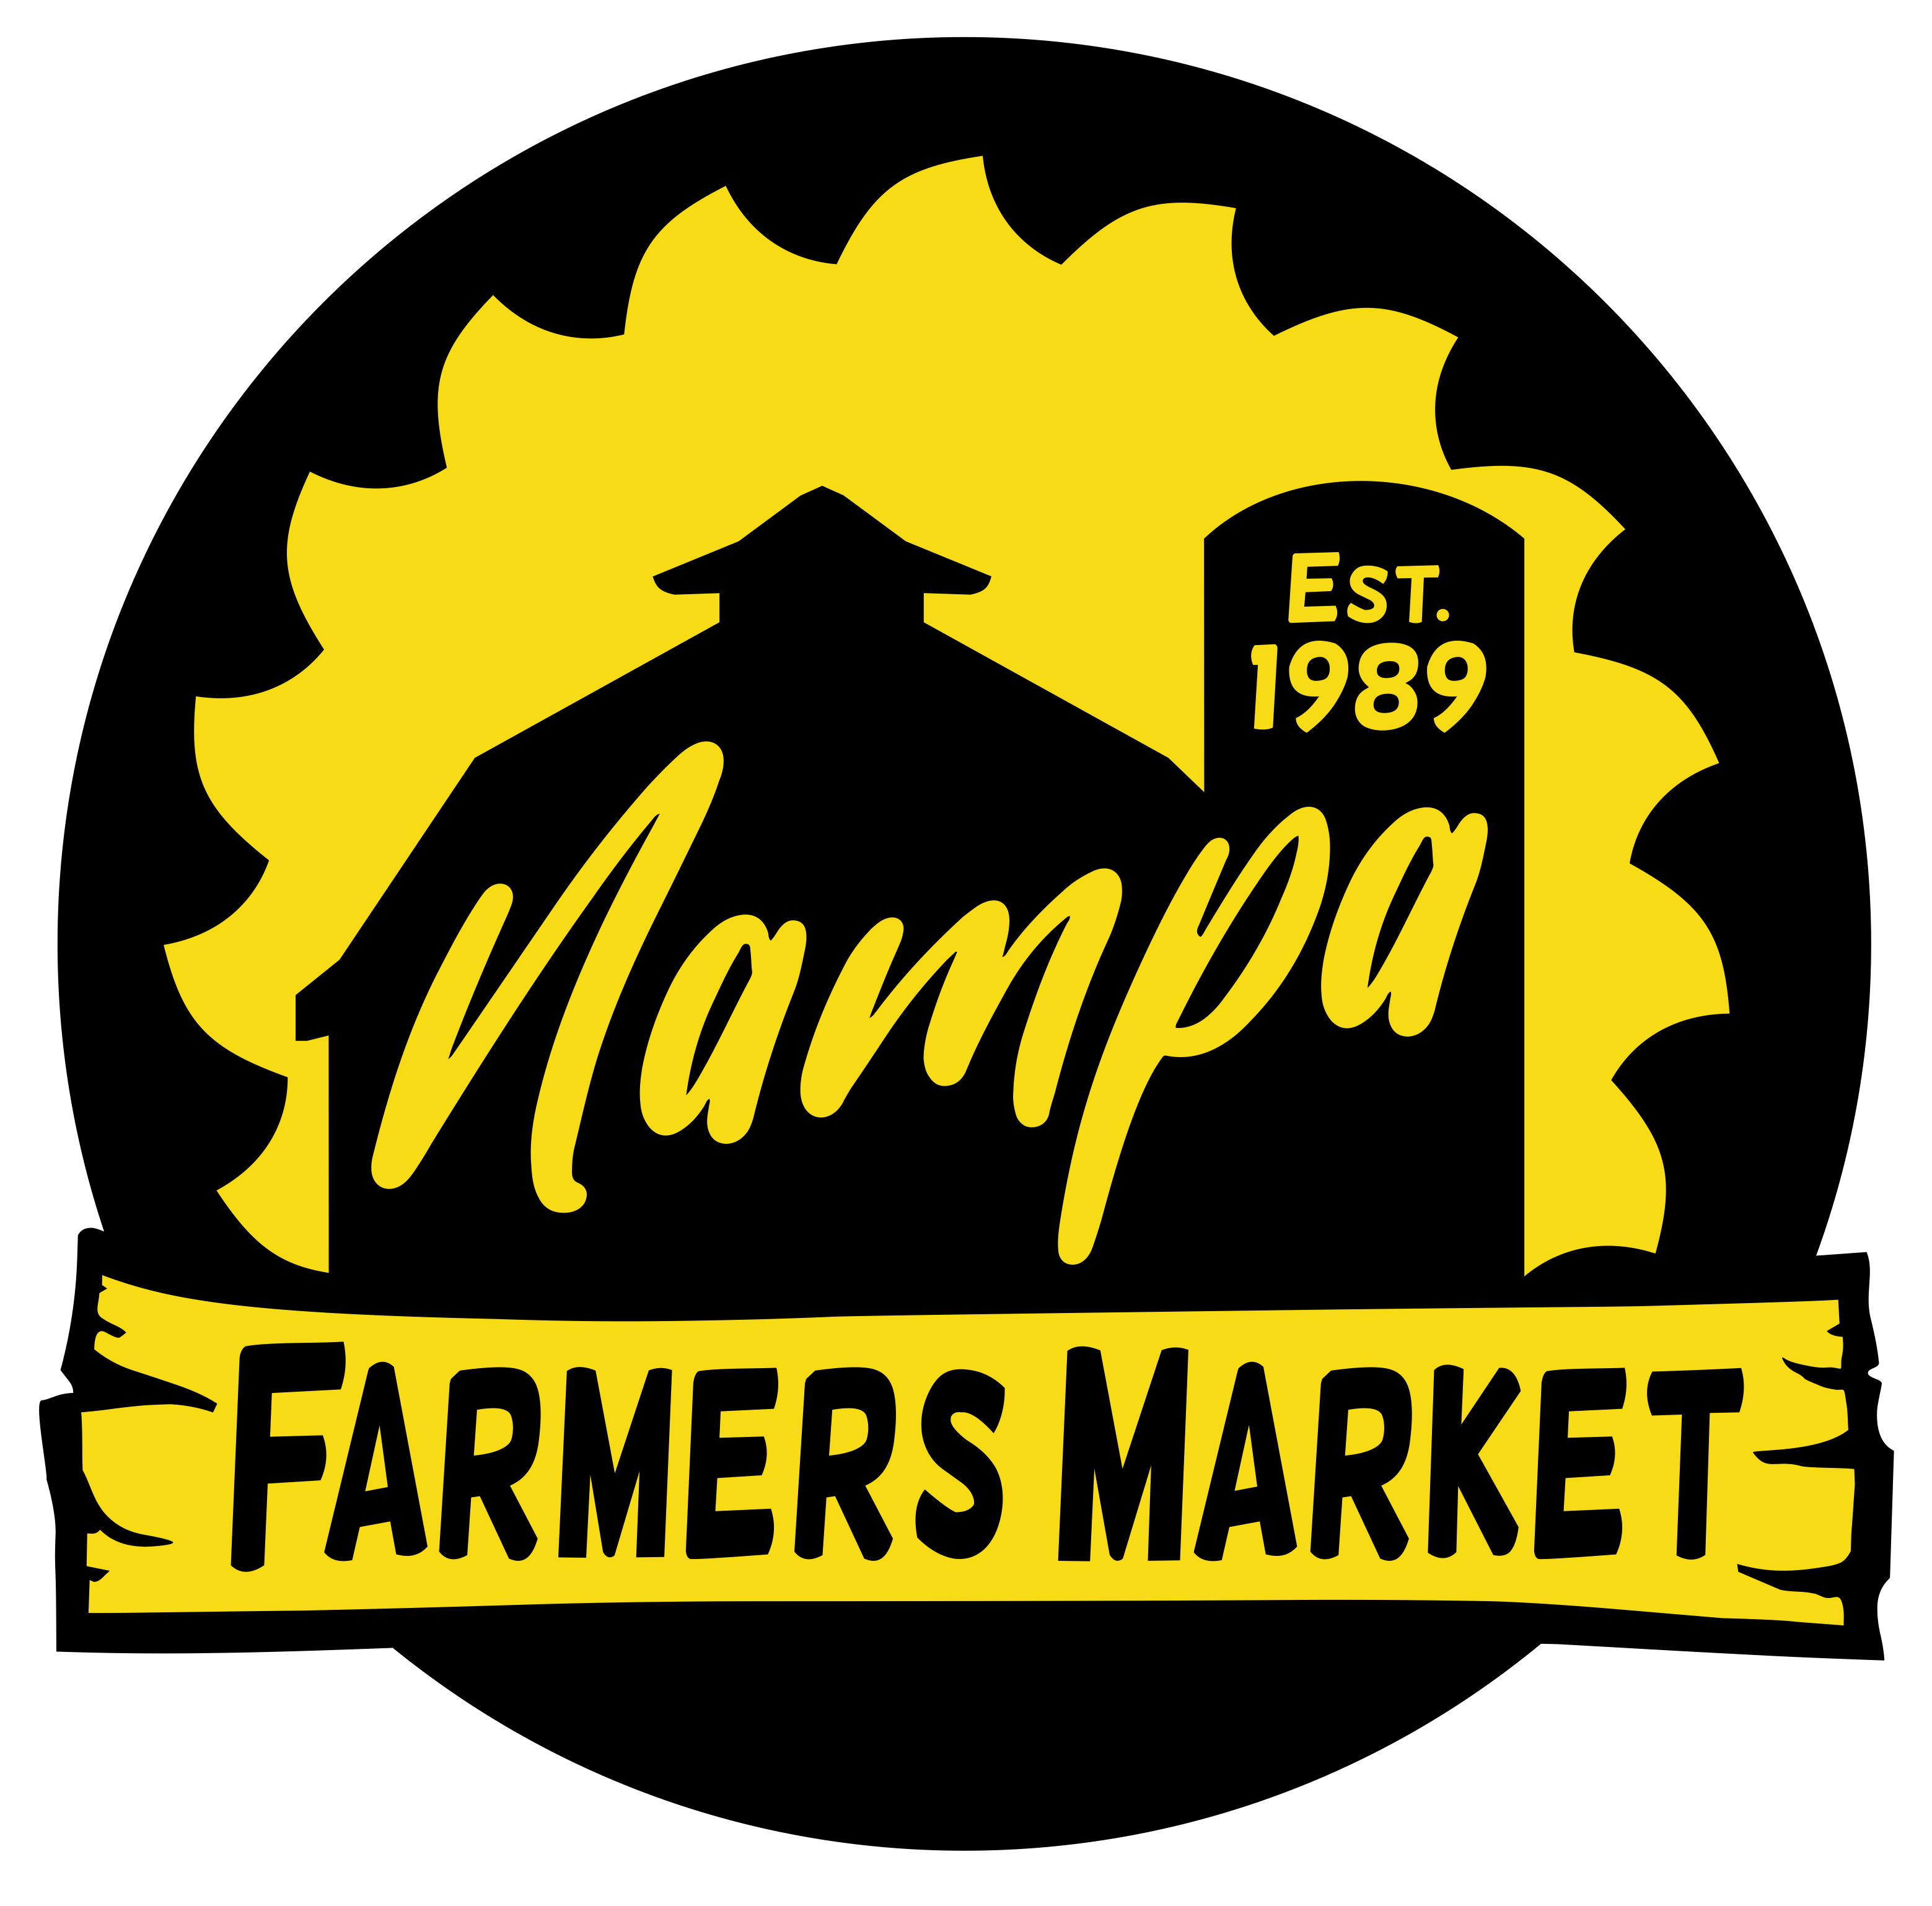 Nampa Farmers Market Gets New Look